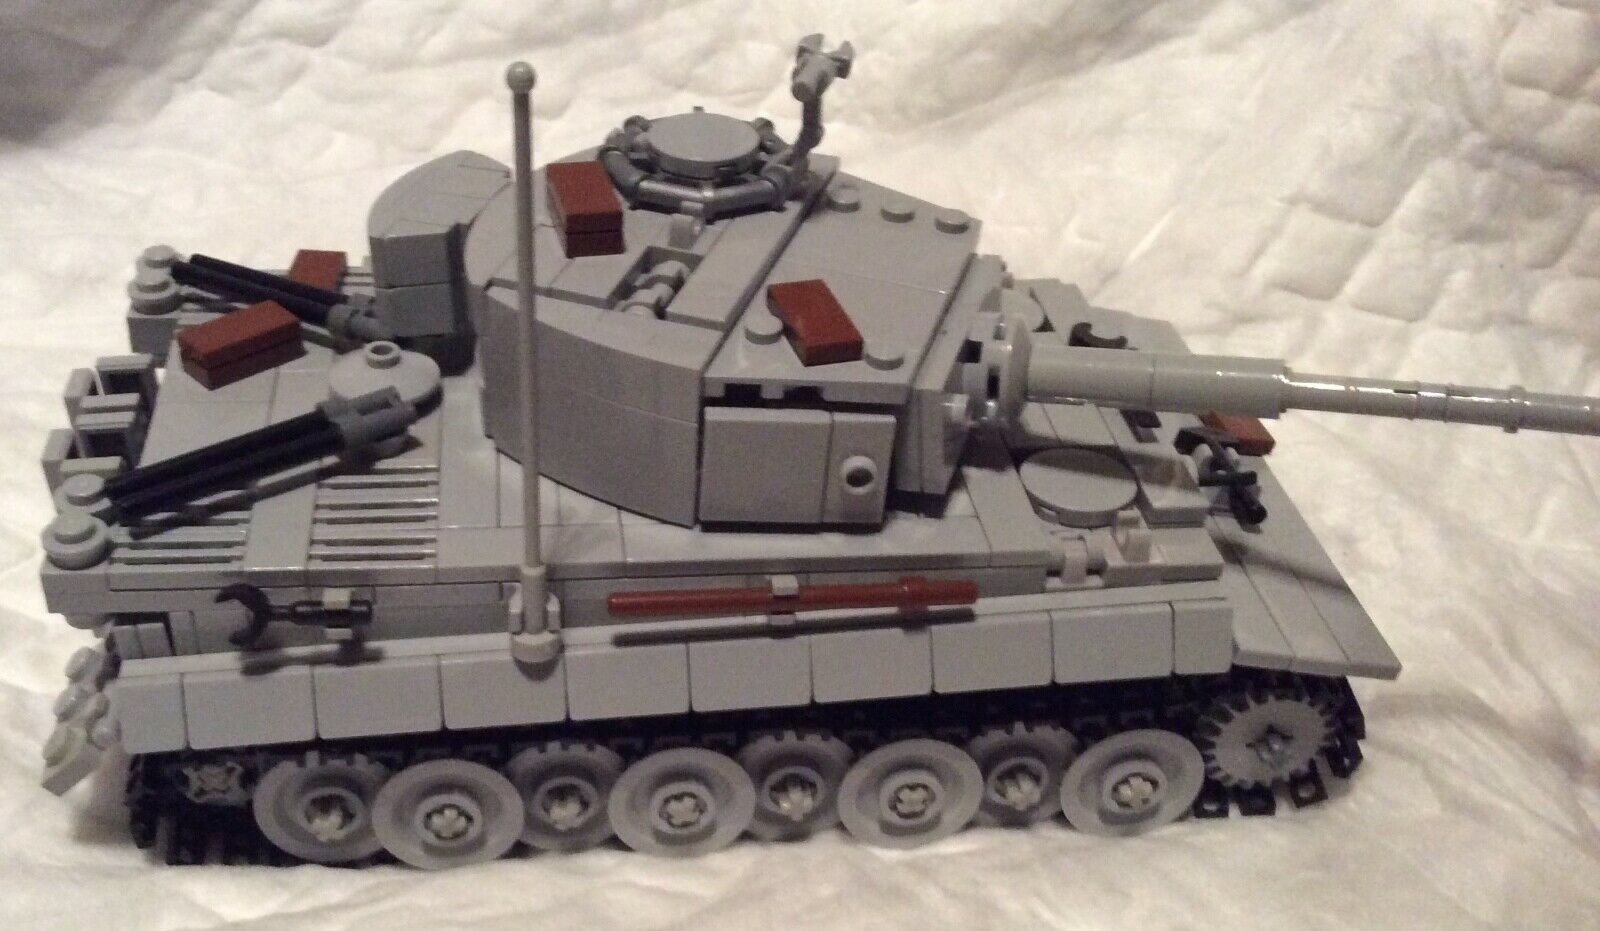 Ss LEGO - Panzerkampfwagen VI - 'TIGER' (1942-1944) - Scala 1 32